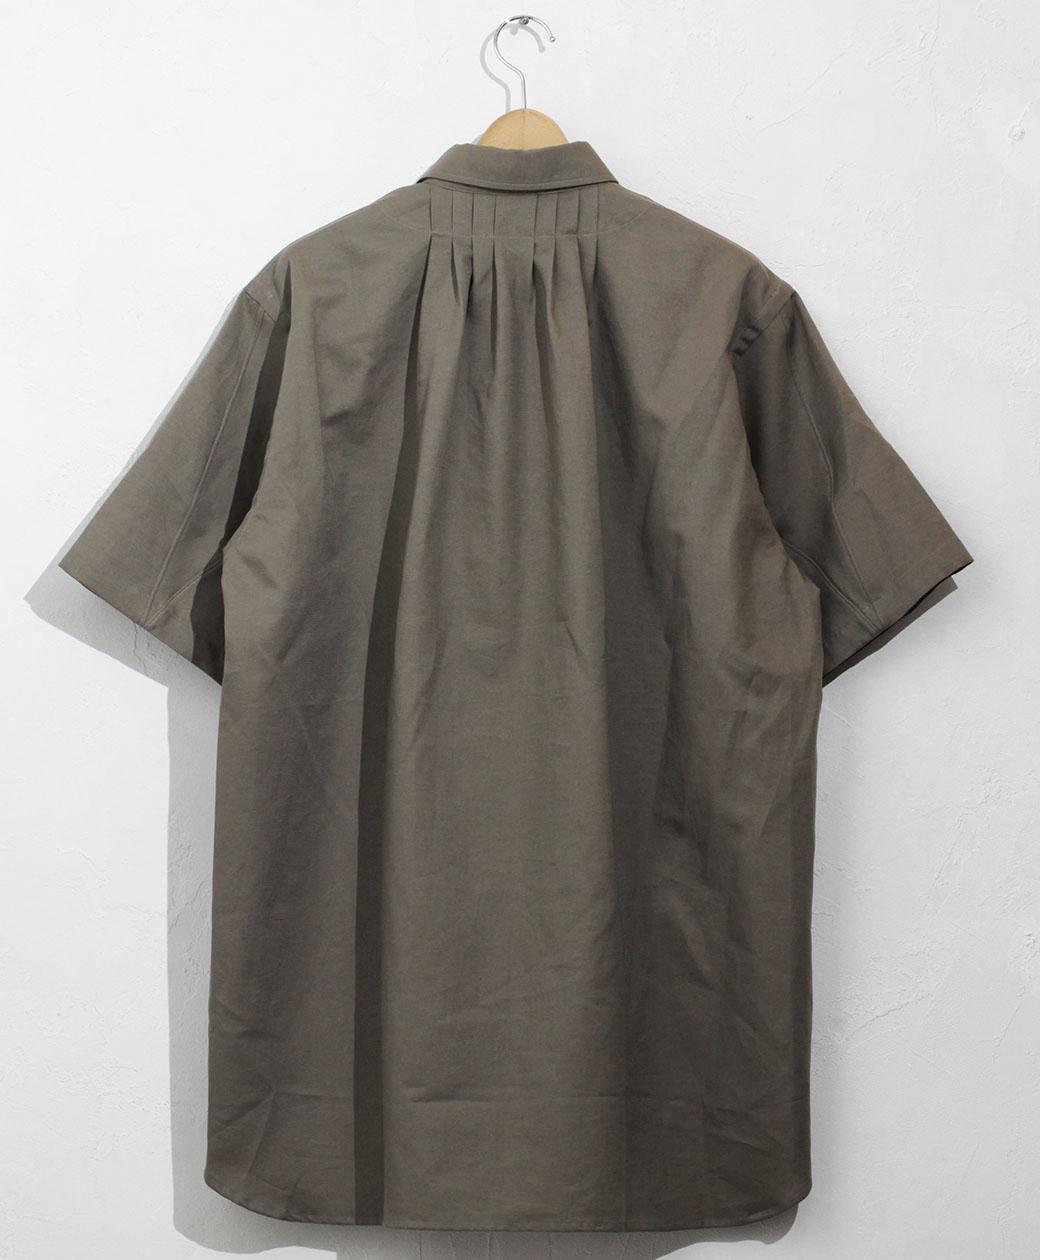 SUNNY ELEMENT Sleeping Shirt S/S(Smoke)